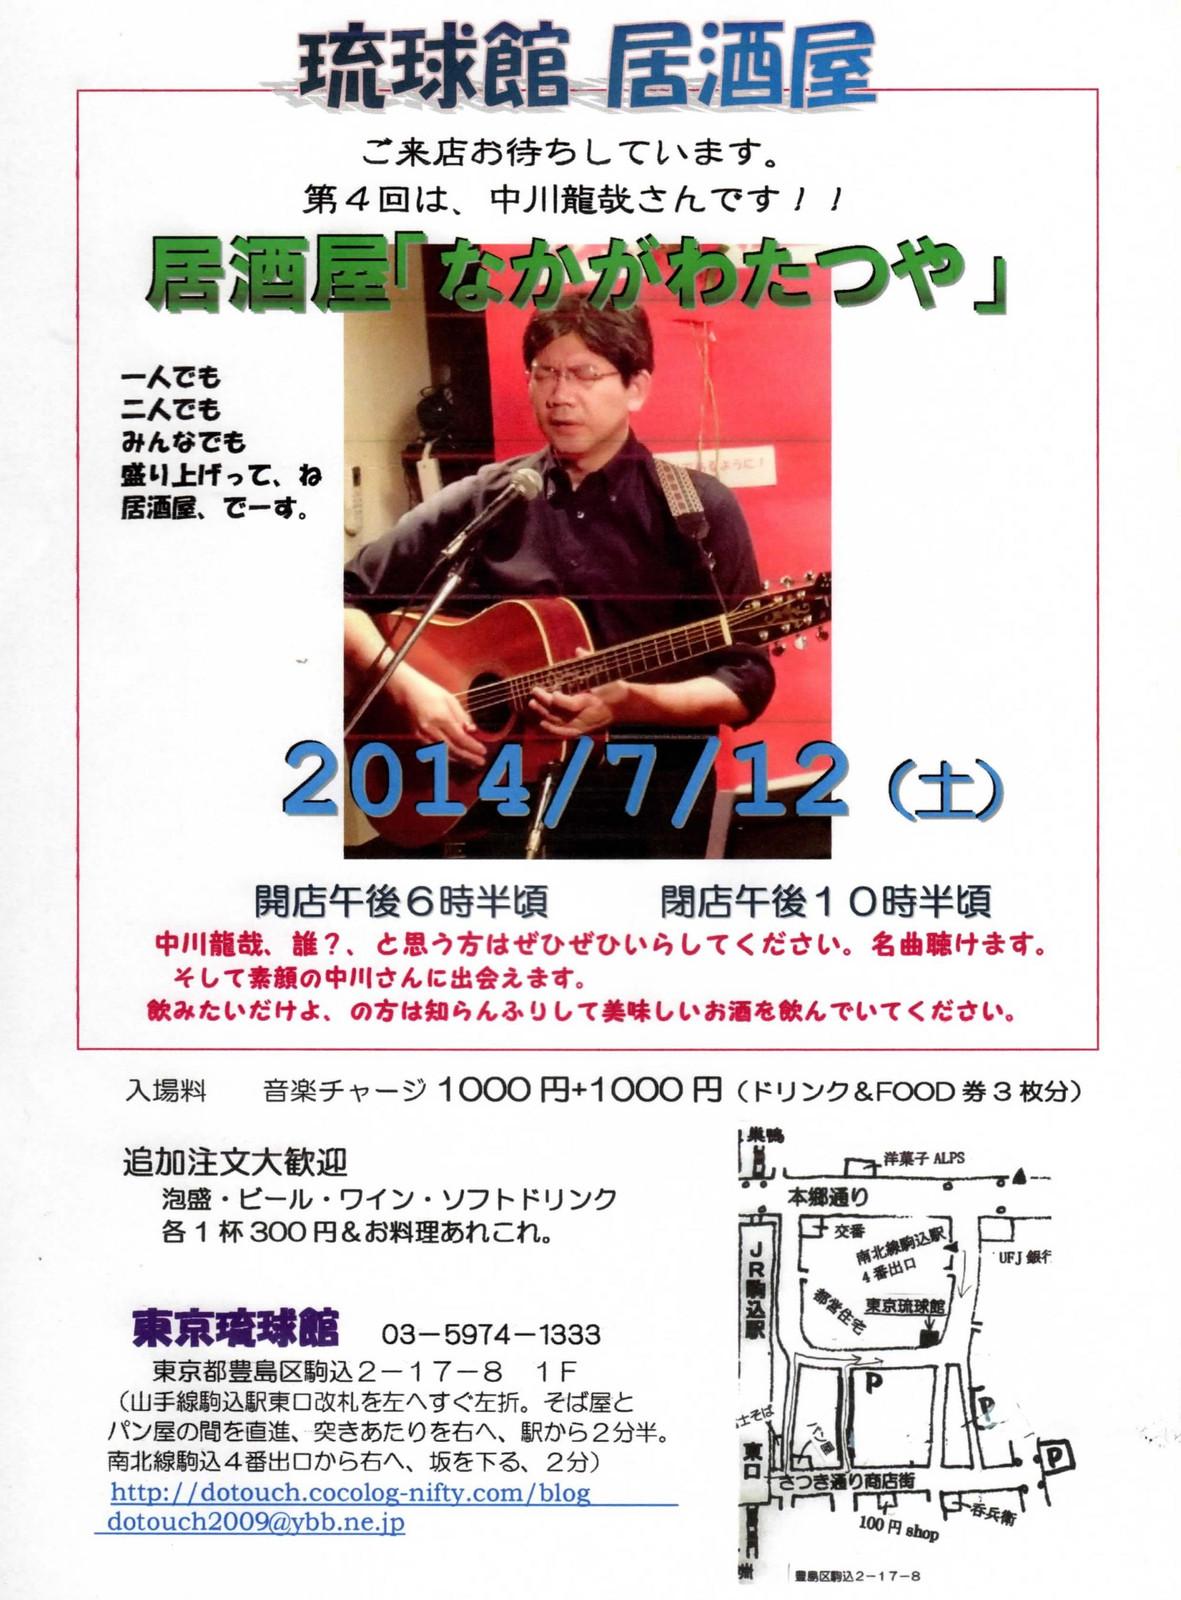 Izakaya4_convert_20140603220857